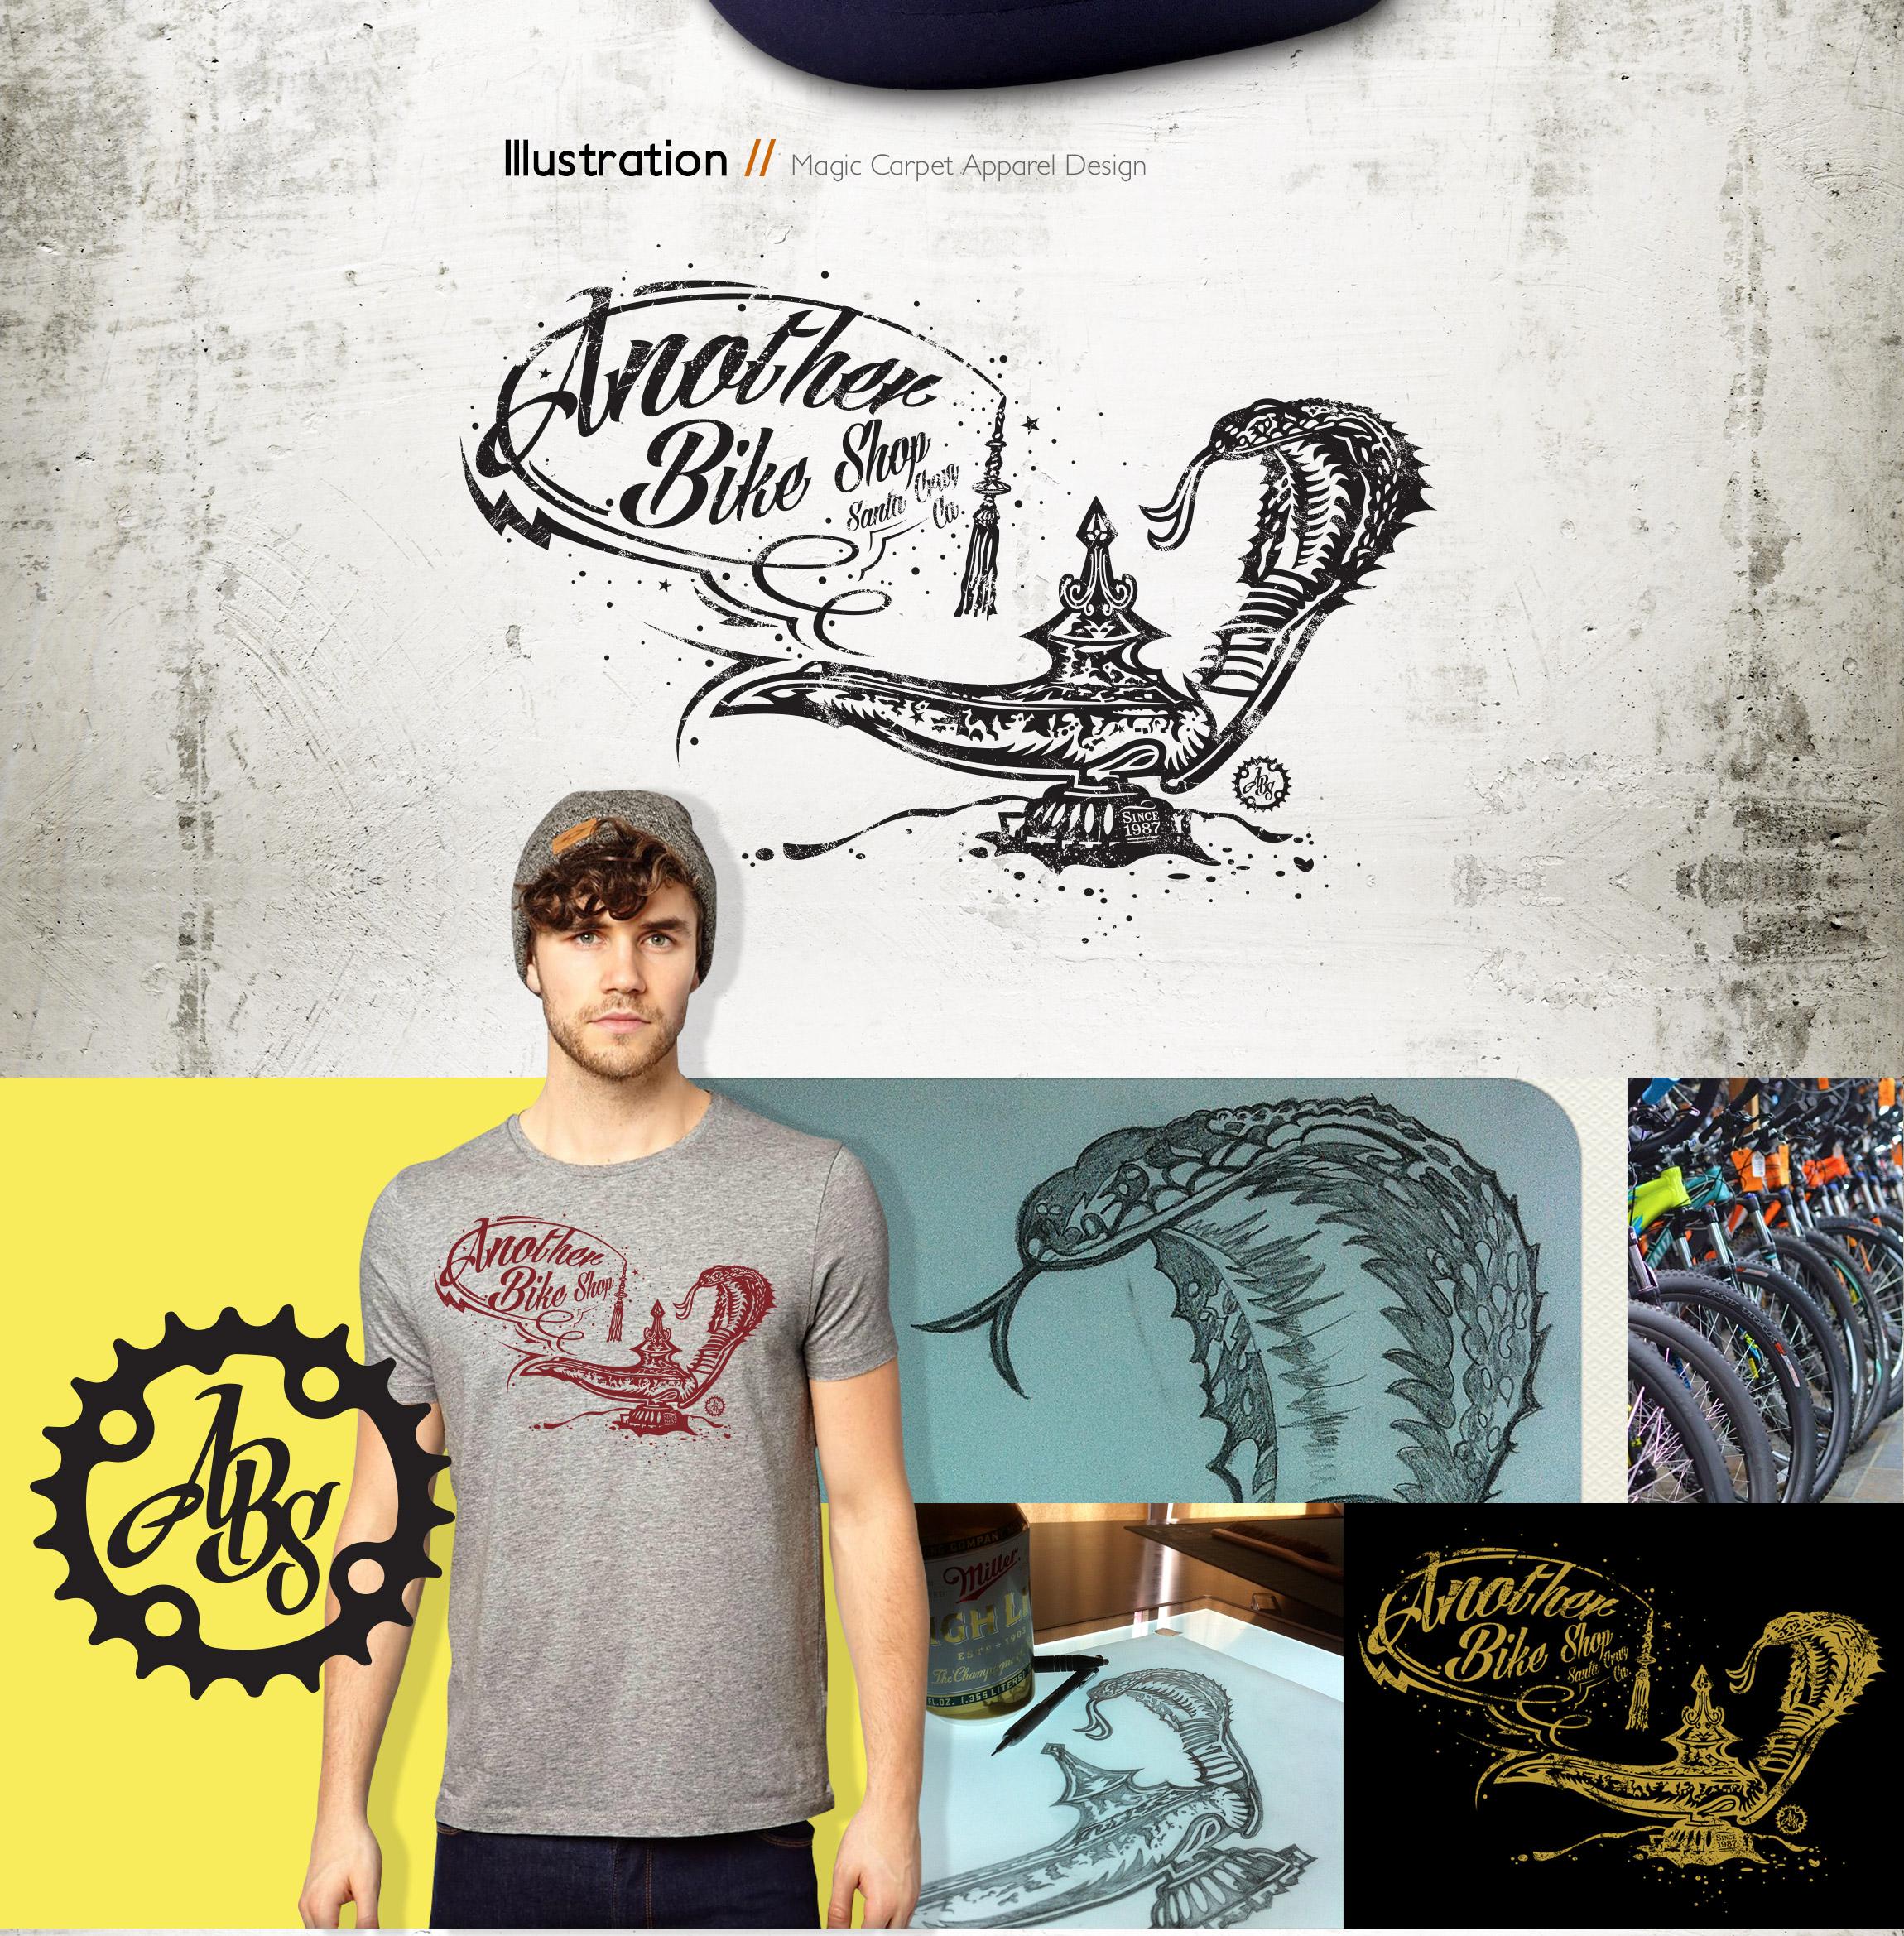 ABS - Another Bike Shop - Magic Carpet tee bike apparel design - Graphic Regime